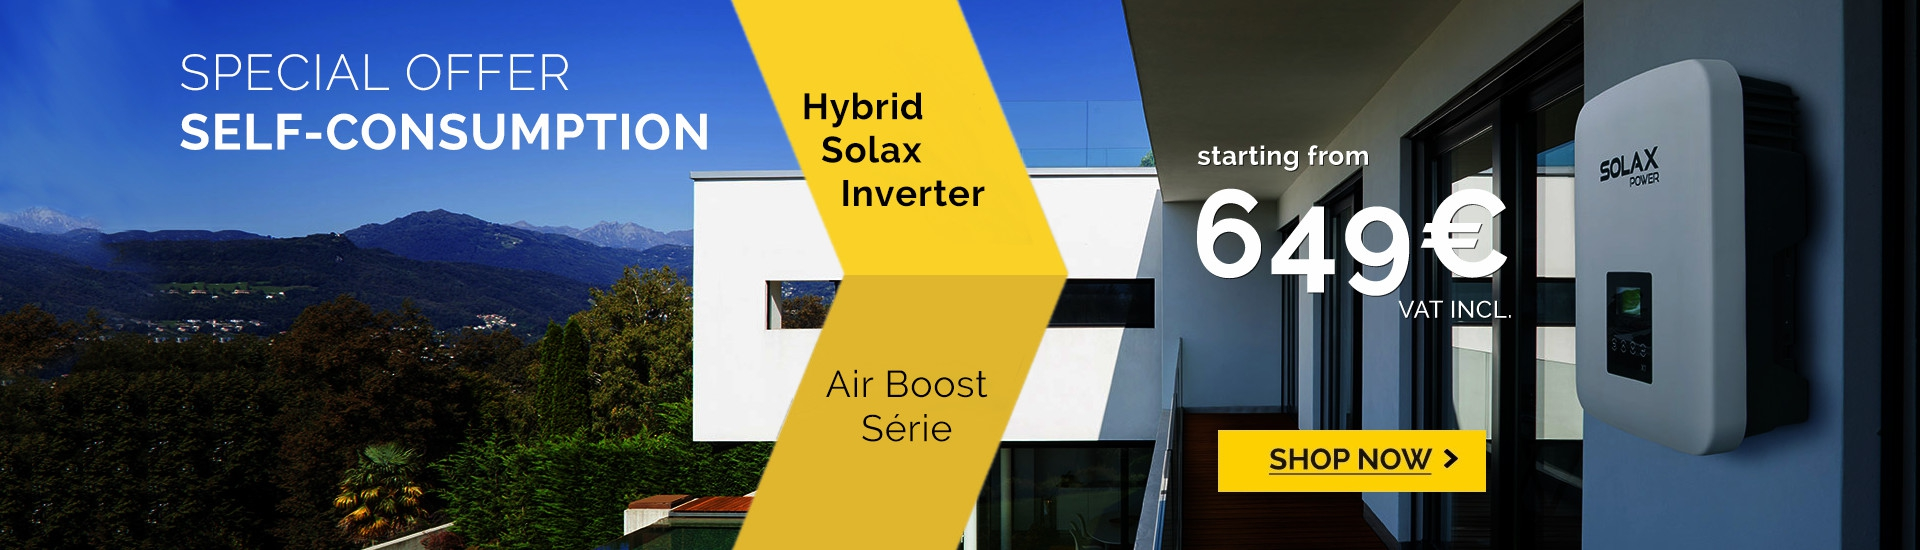 SolaX Hybrid inverter X1-Air Boost 3000